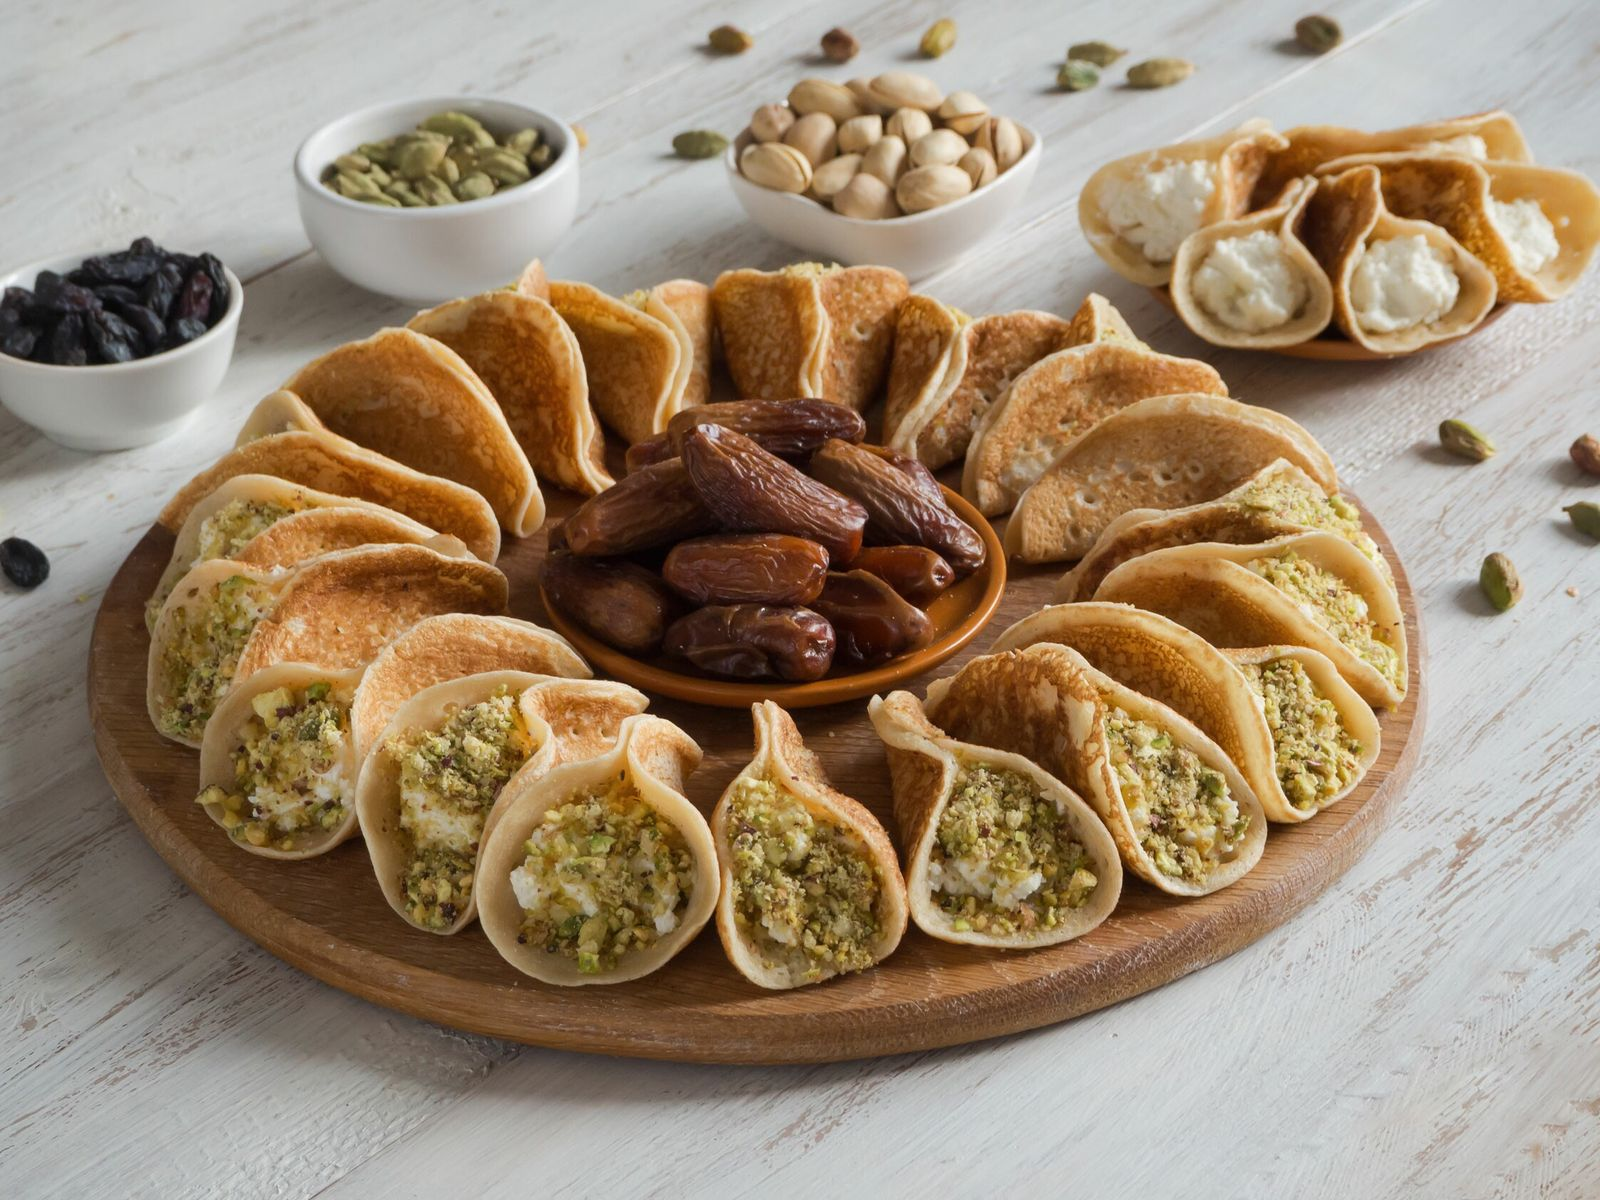 In Egypt, Jordan, Lebanon, Palestine, Syria and the Gulf, a favourite iftar dessert is qatayef, a ...